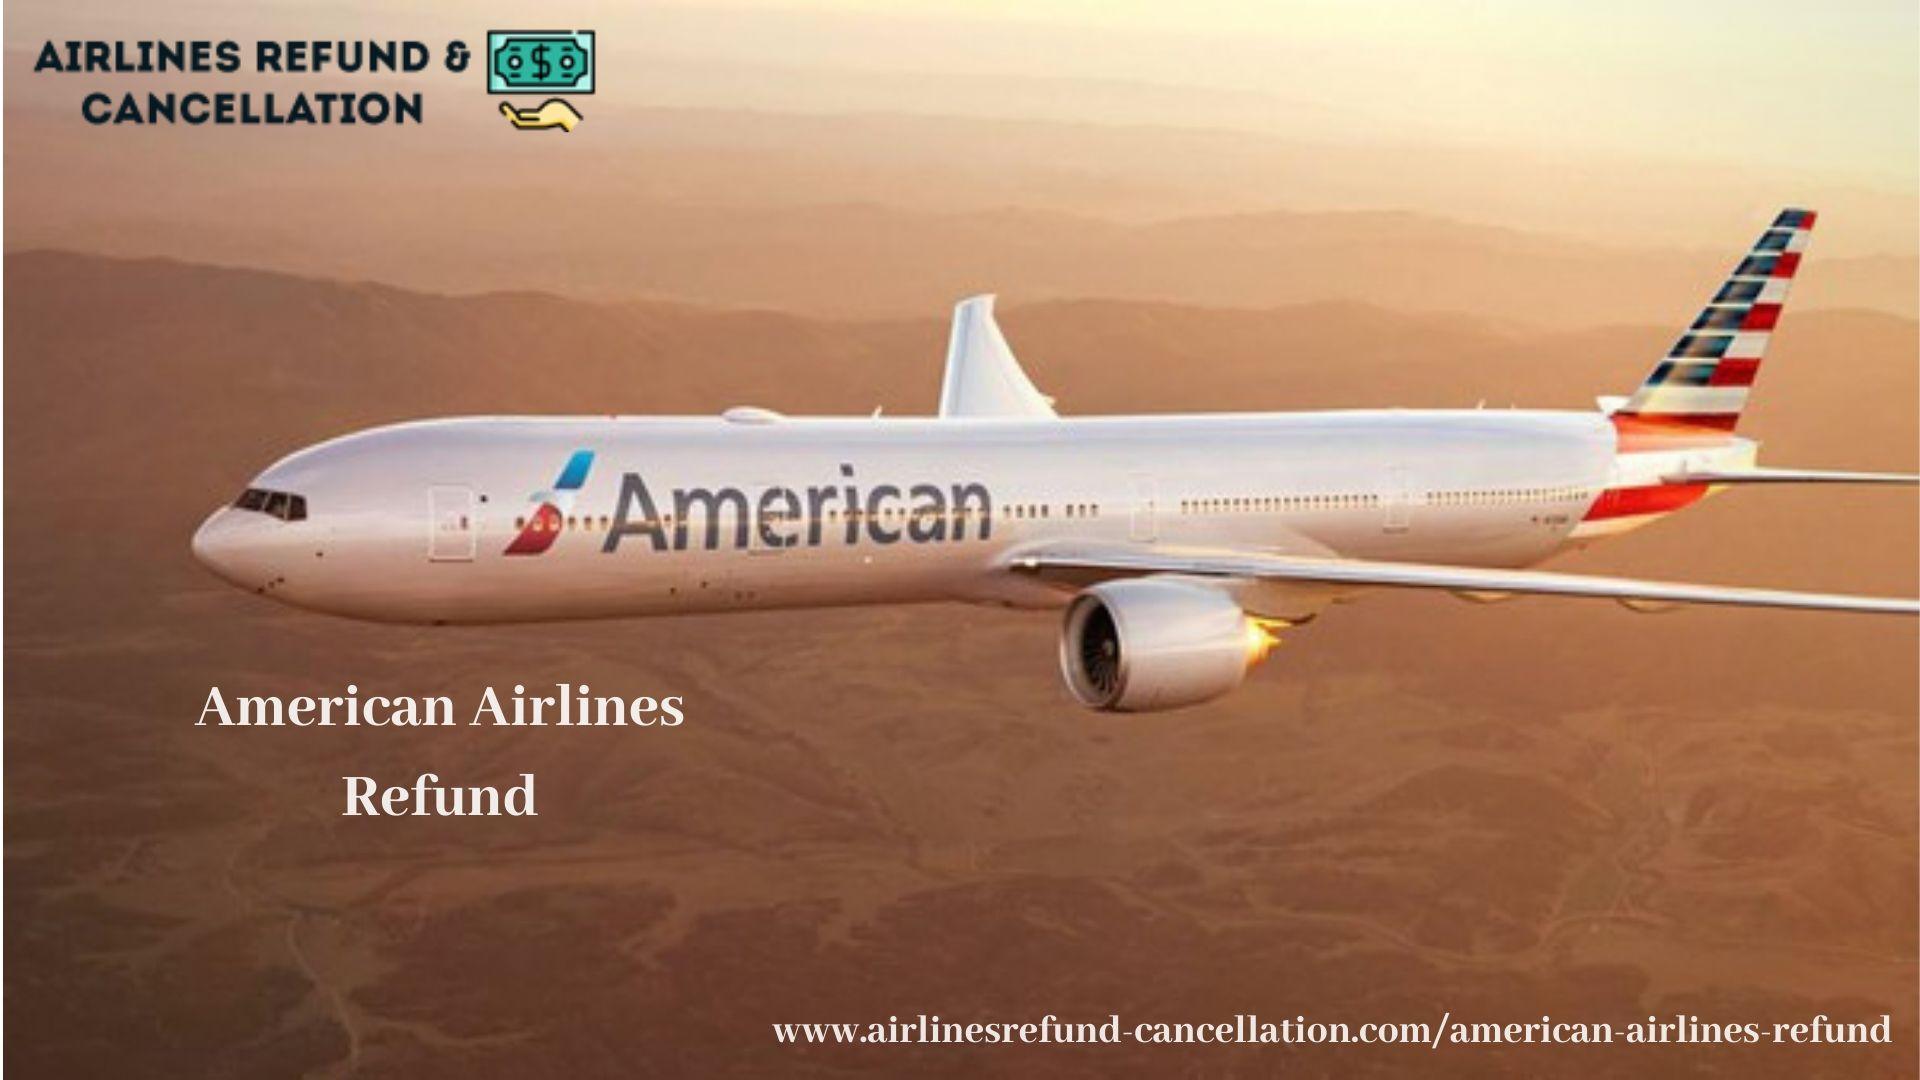 American Airlines Refund, American Airlines Refunds, American Airlines Refund policy, American Airlines Refund Request, American Airlines Refund Form,